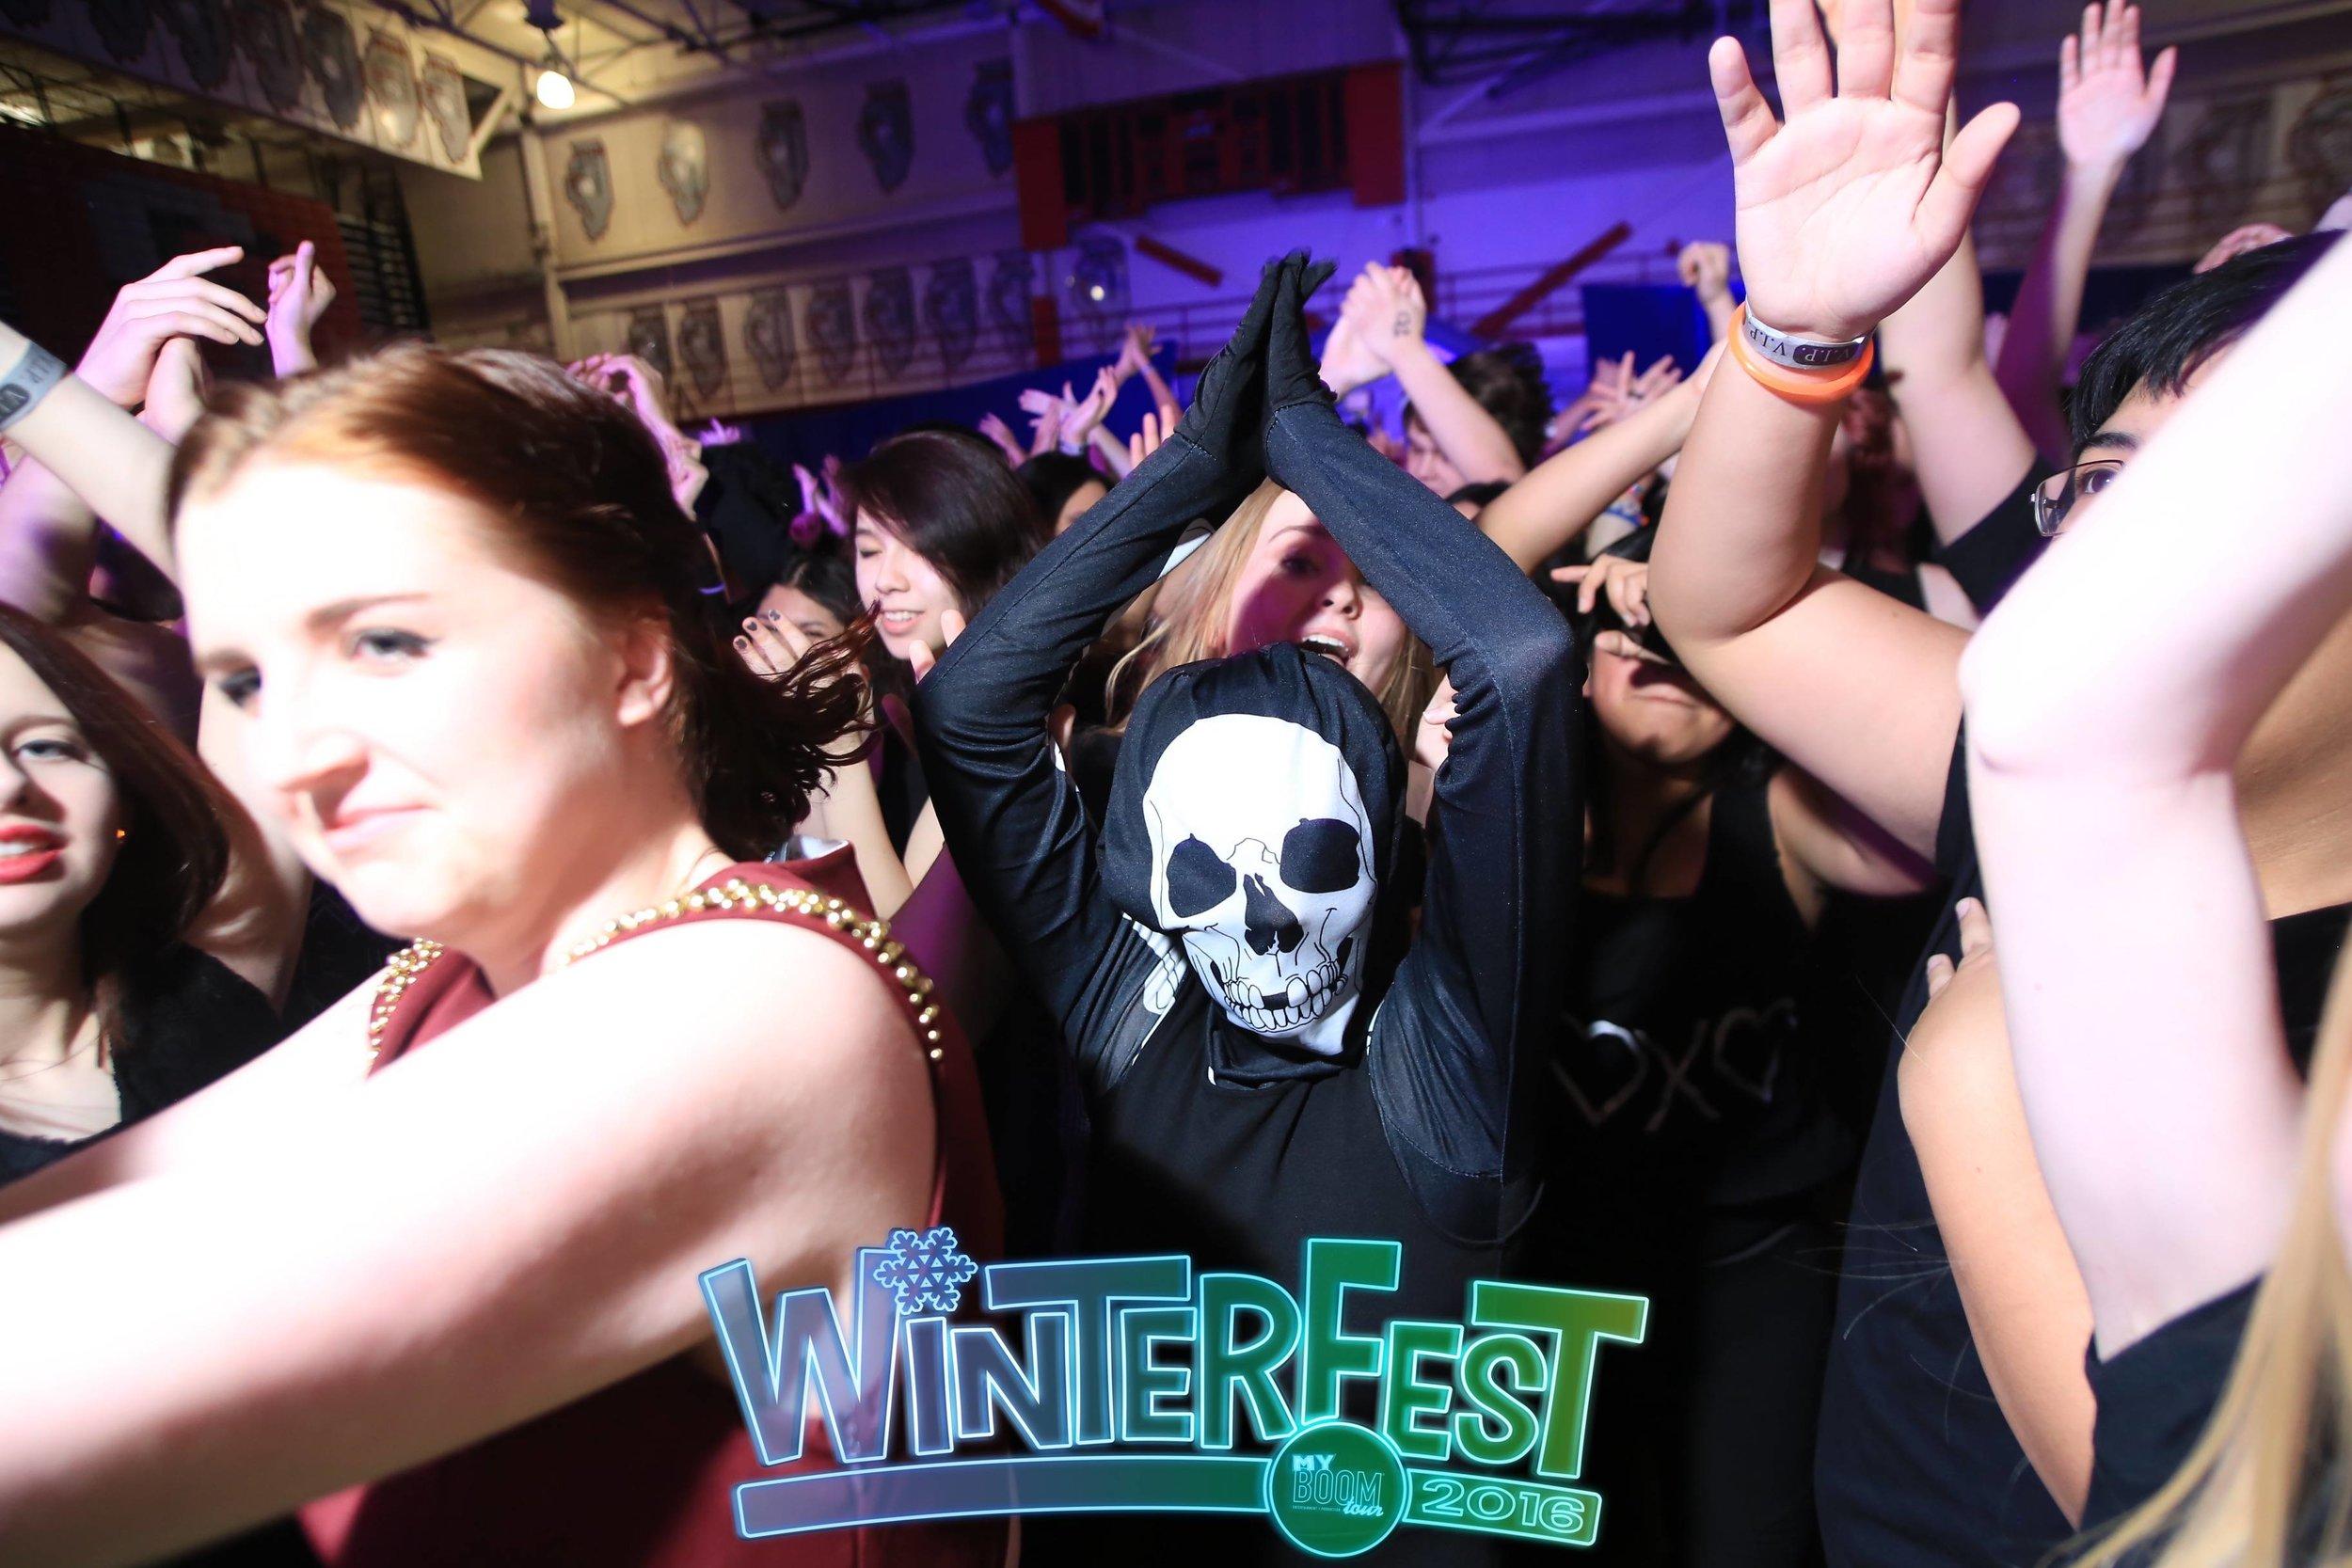 Palatine WinterFest16 Watermarked Good127 copy.JPG